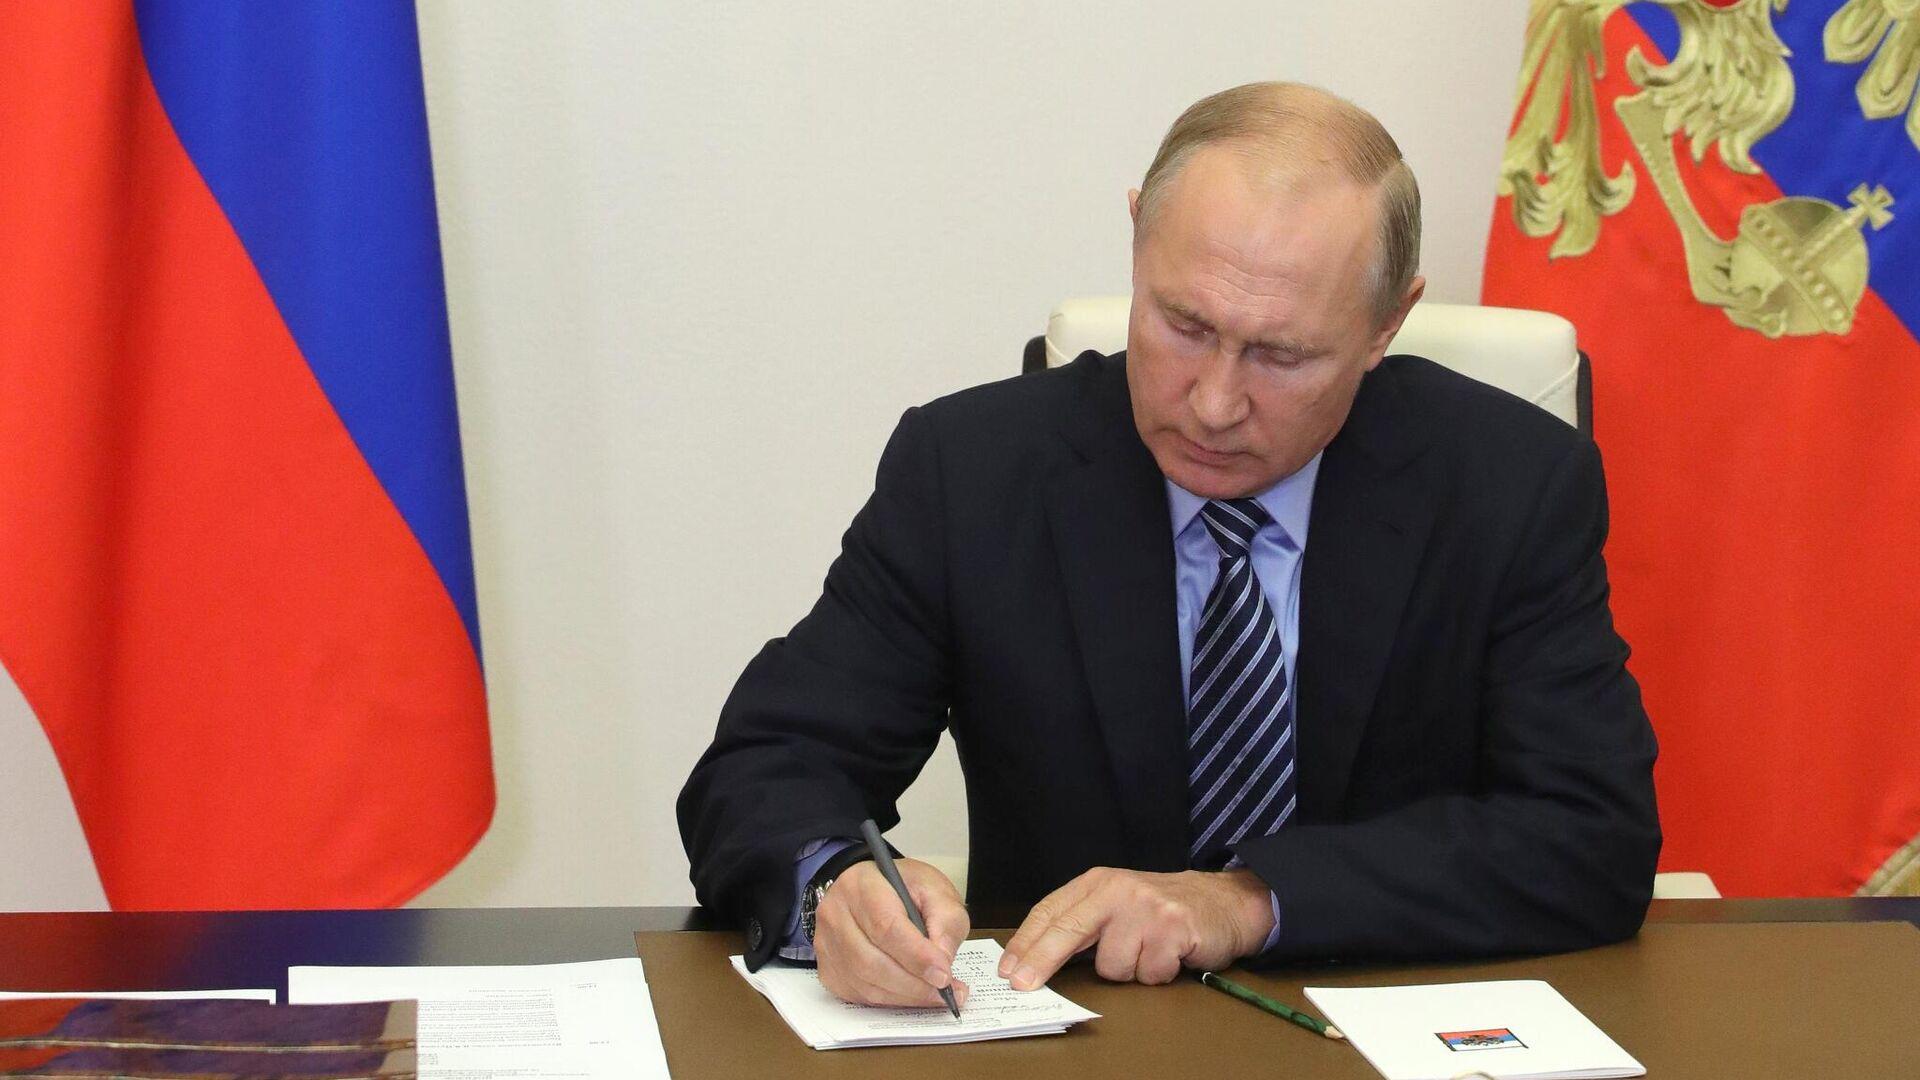 Президент РФ Владимир Путин - РИА Новости, 1920, 21.09.2020